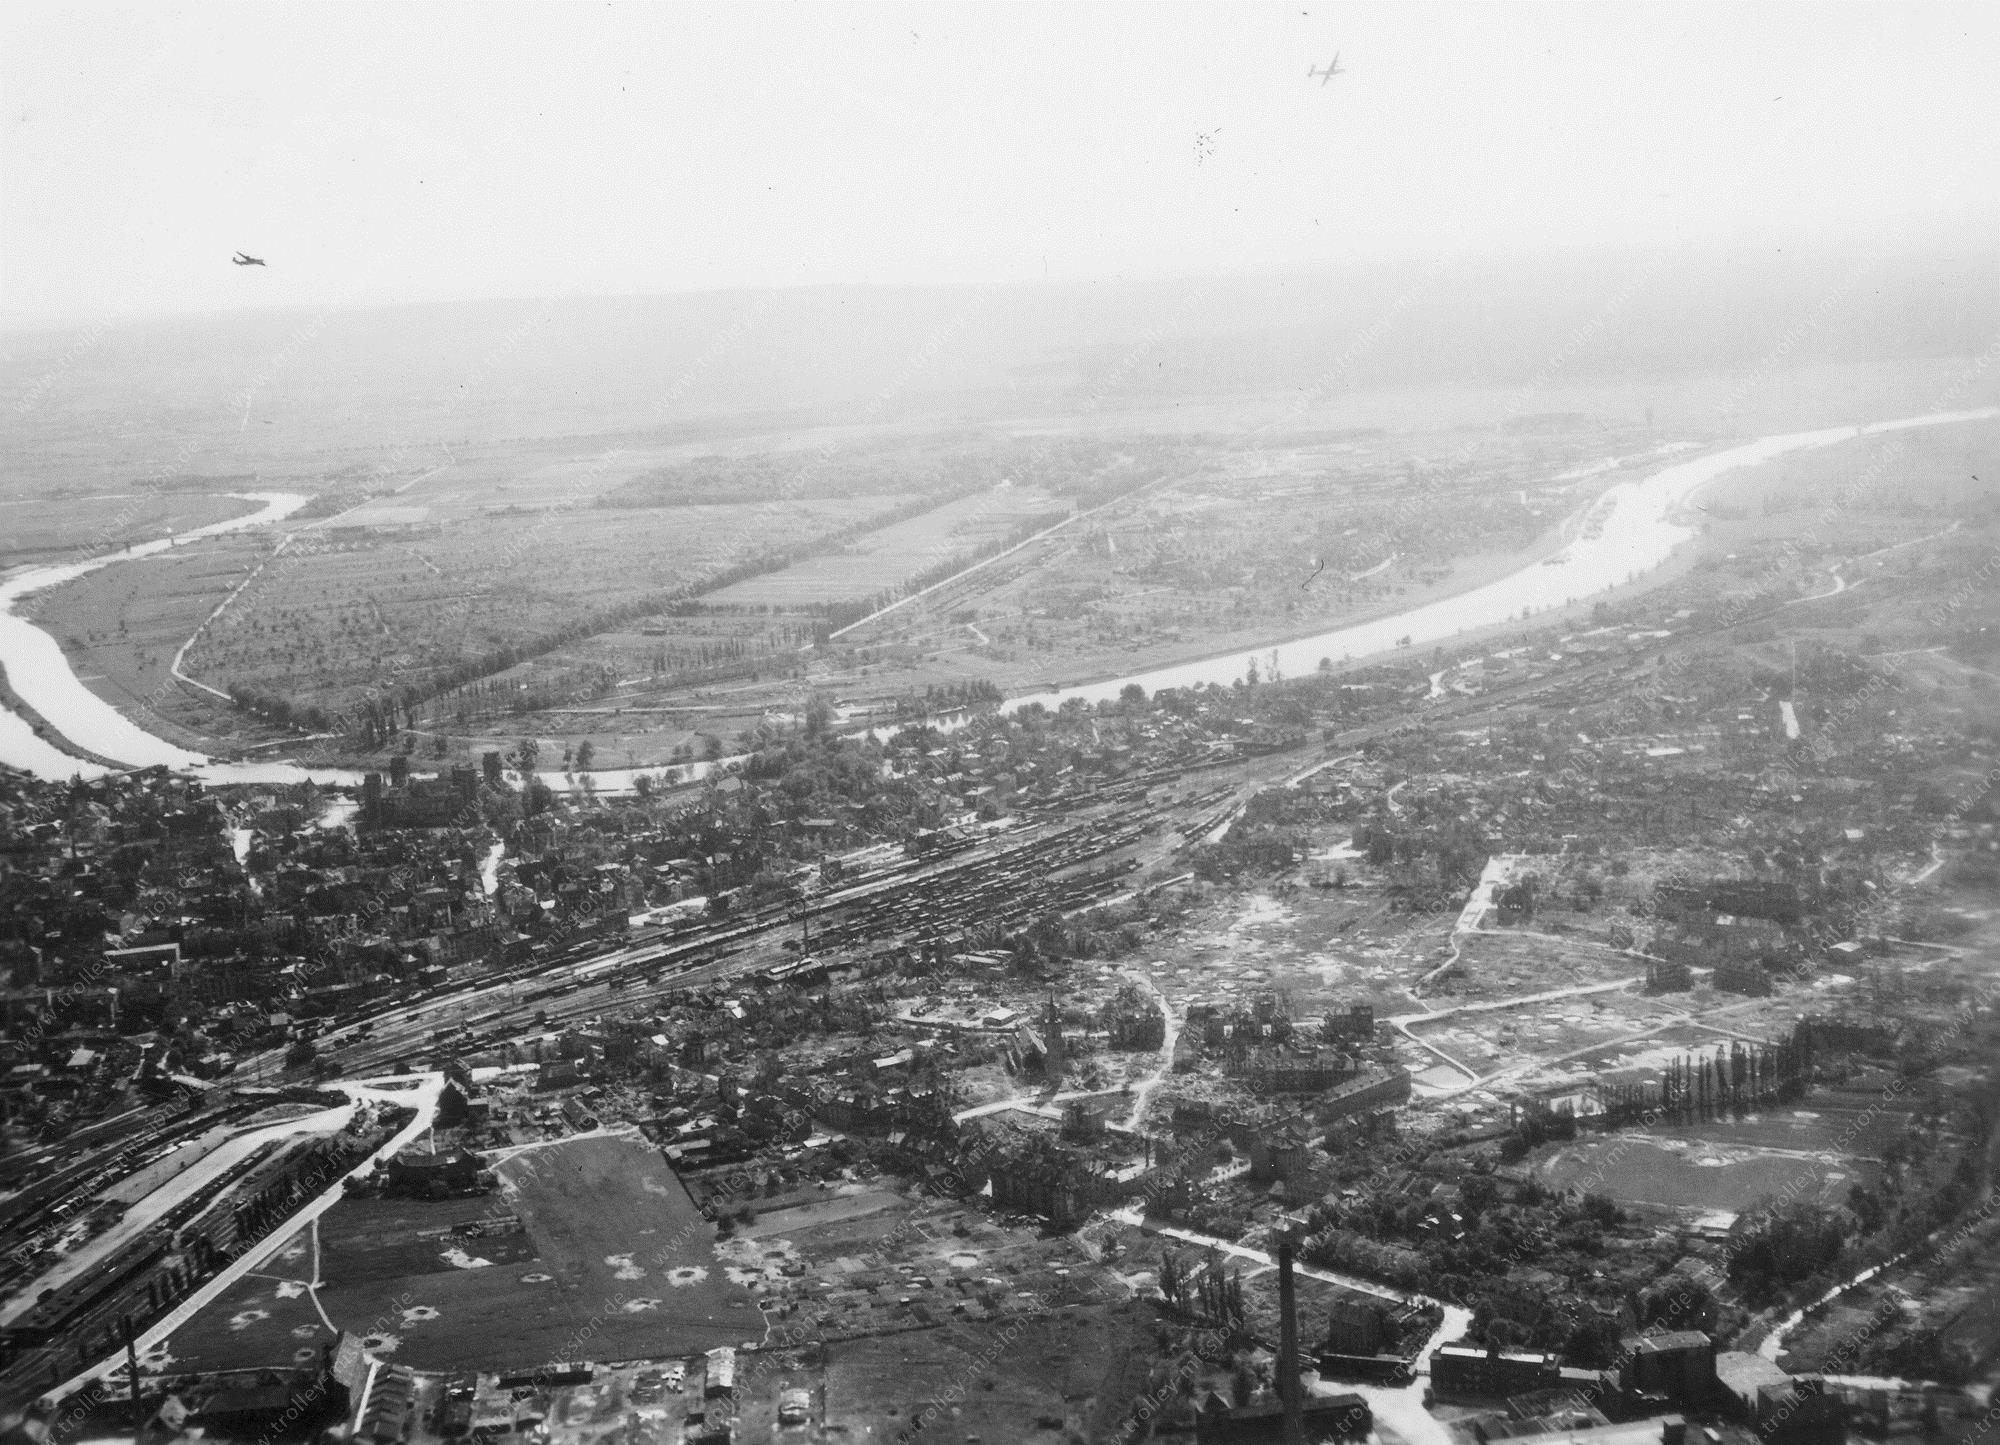 Aschaffenburg Luftbild Schloß Johannisburg